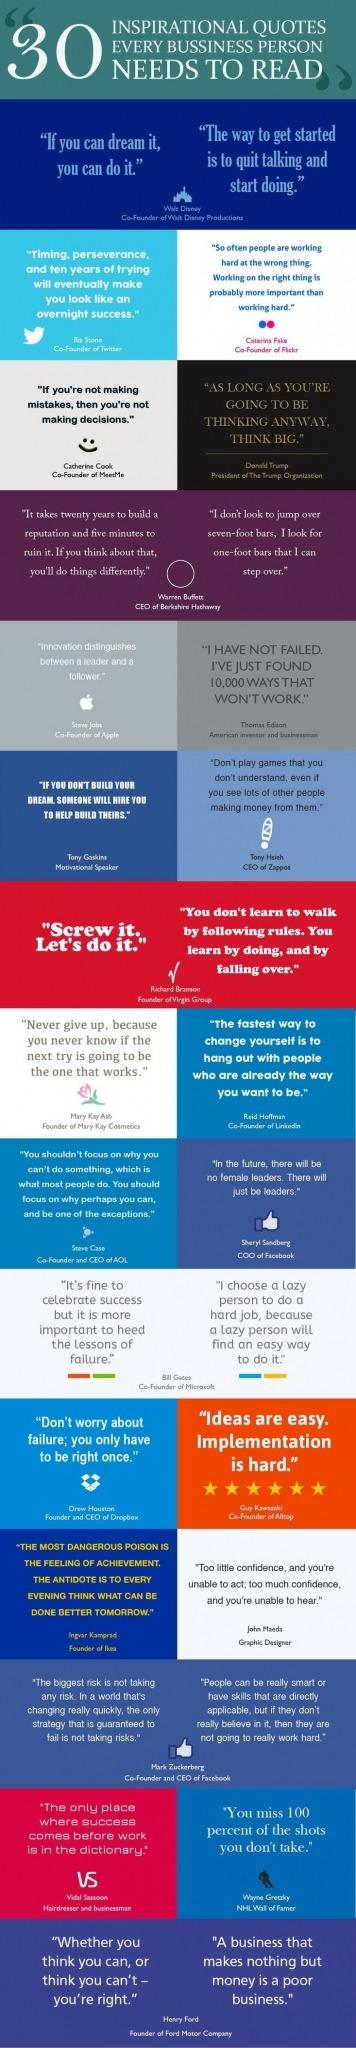 Inspirational-Quotes-for-World-Entrepreneurs Inspirational Quotes for World Entrepreneurs